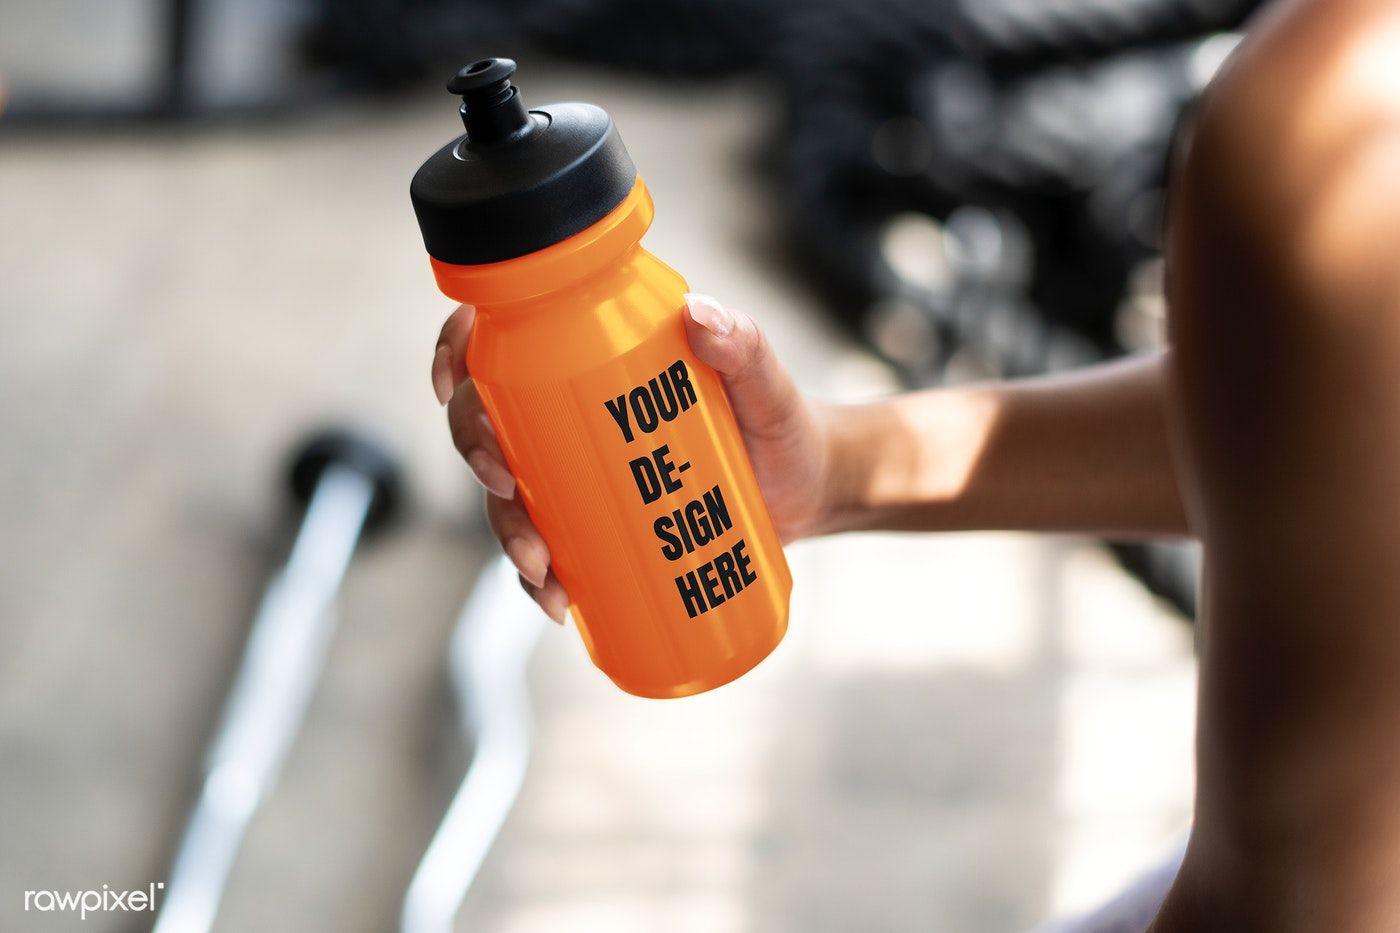 Download Download Premium Psd Of Muscular Man Holding An Orange Water Bottle Mockup In 2020 Bottle Mockup Bottle Orange Water